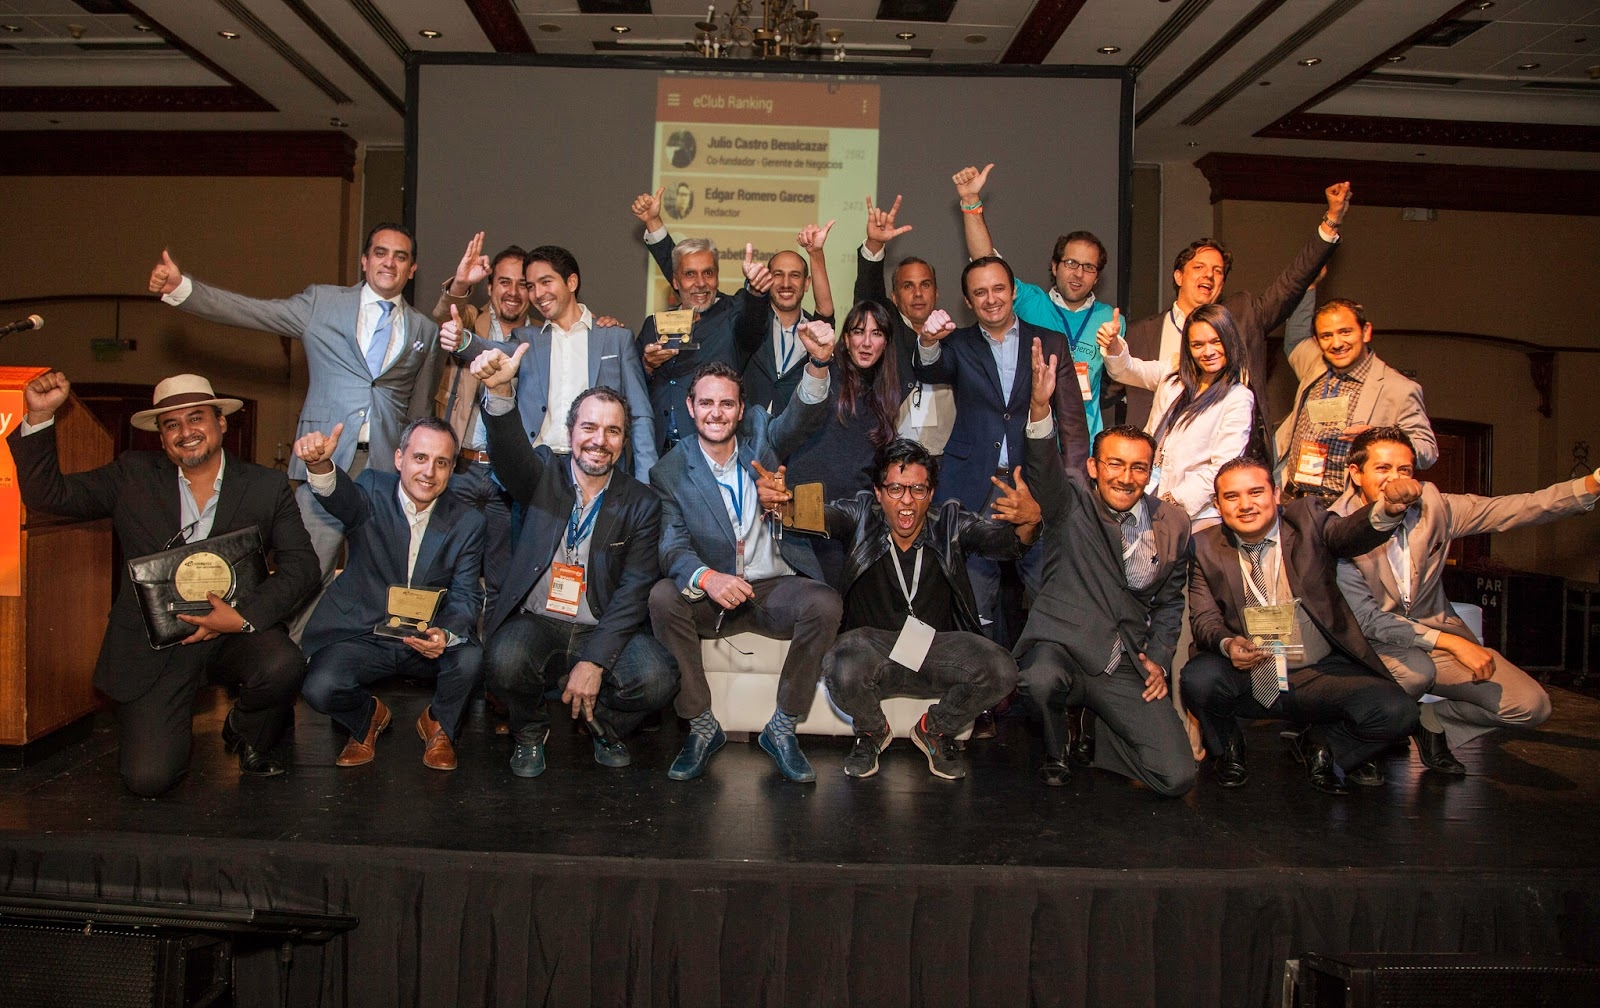 Abierta la convocatoria al eCommerce Startup Competition en Ecuador